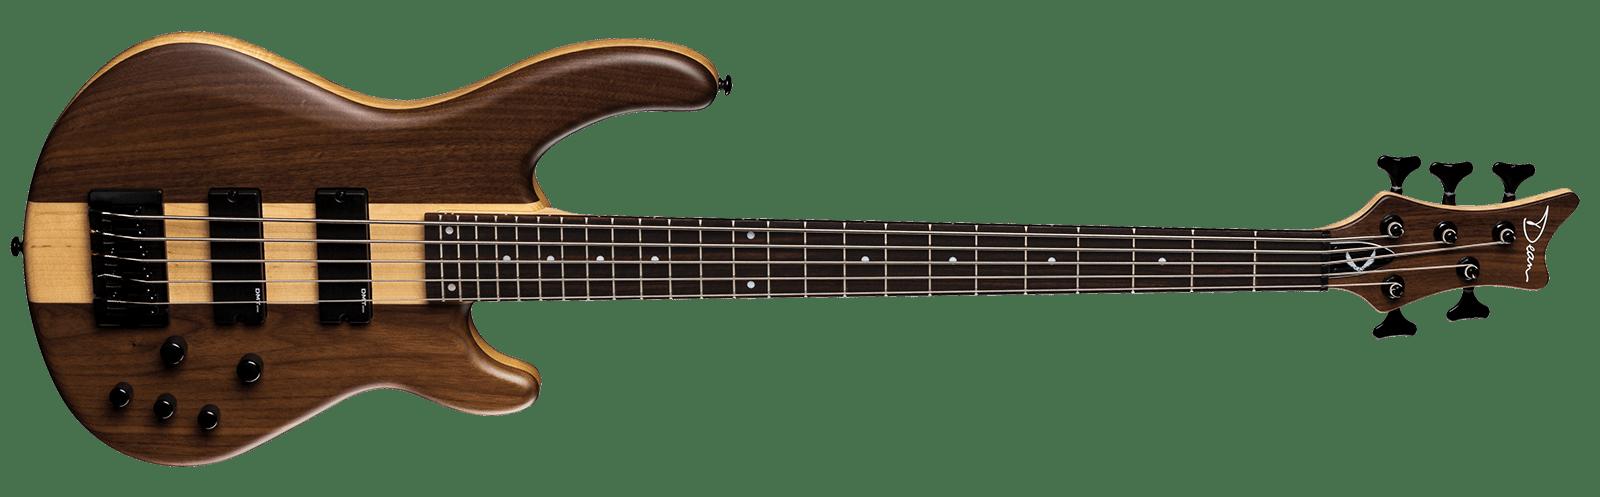 Edge Pro 5 String Walnut Satin Natural